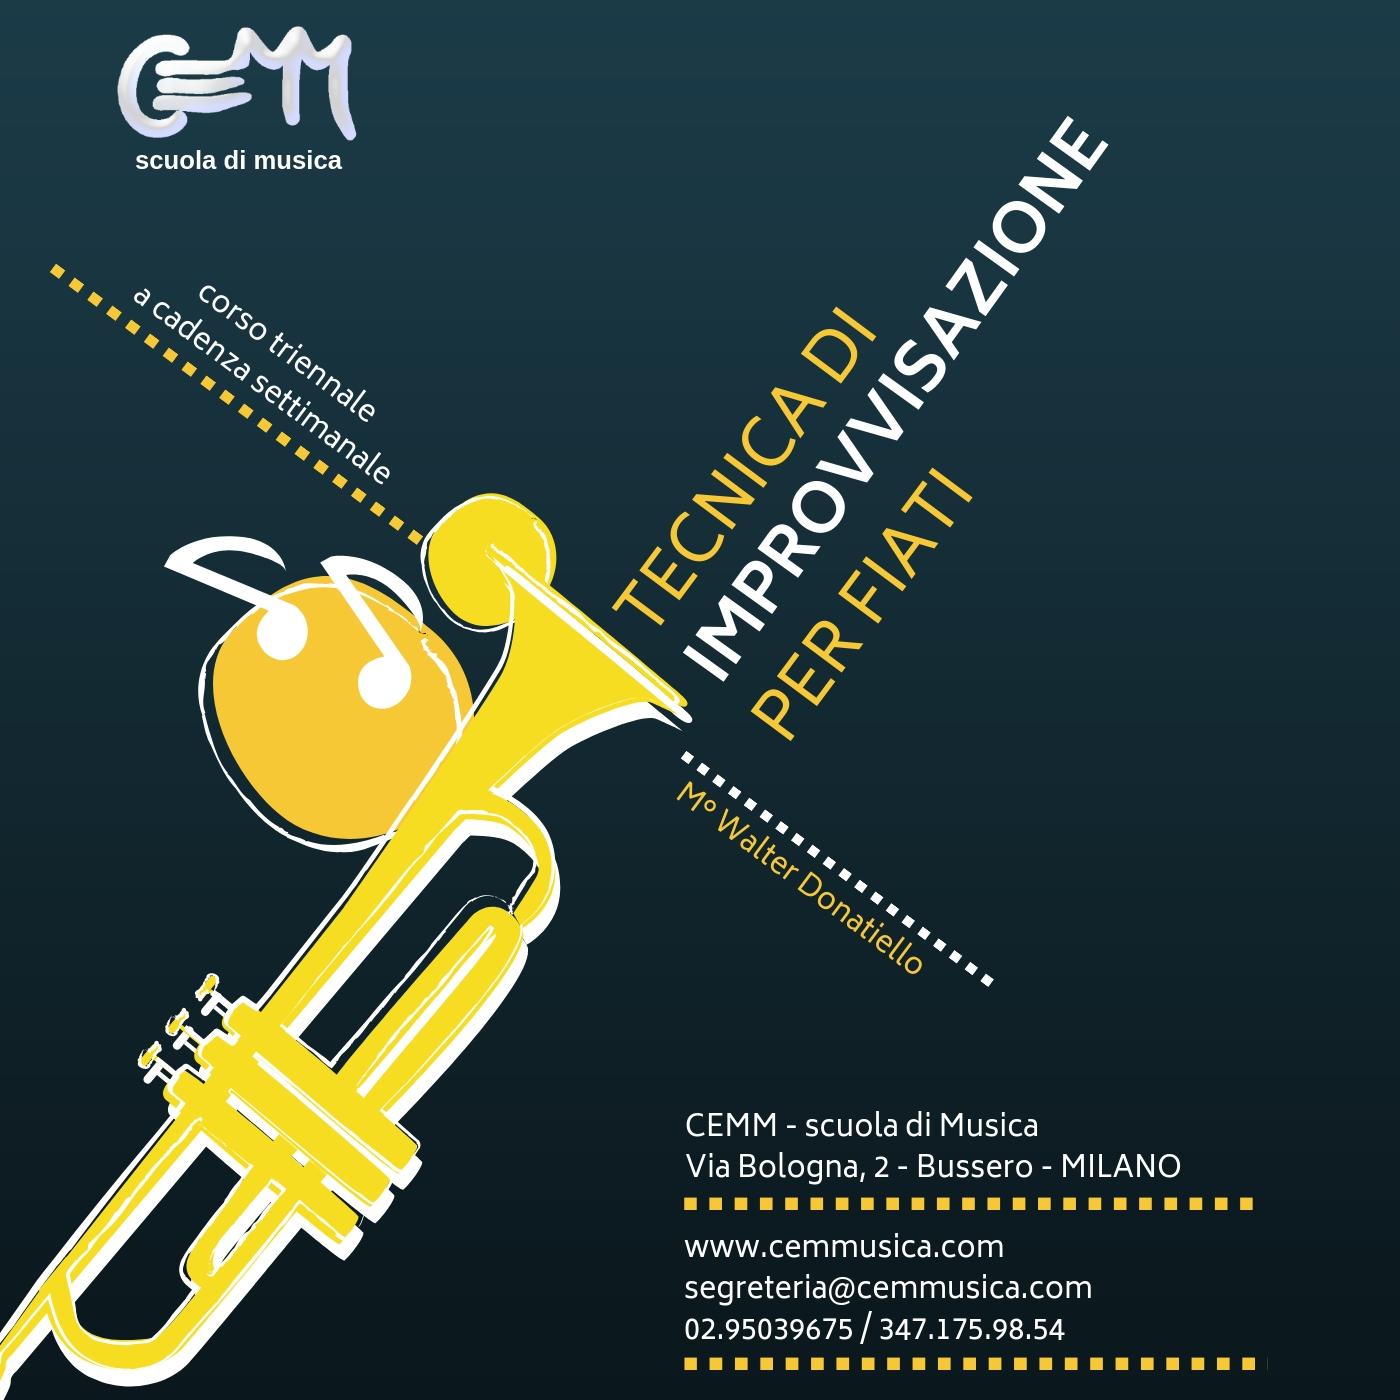 sax, tromba, trombone, clarinetto, improvvisazione, jazz